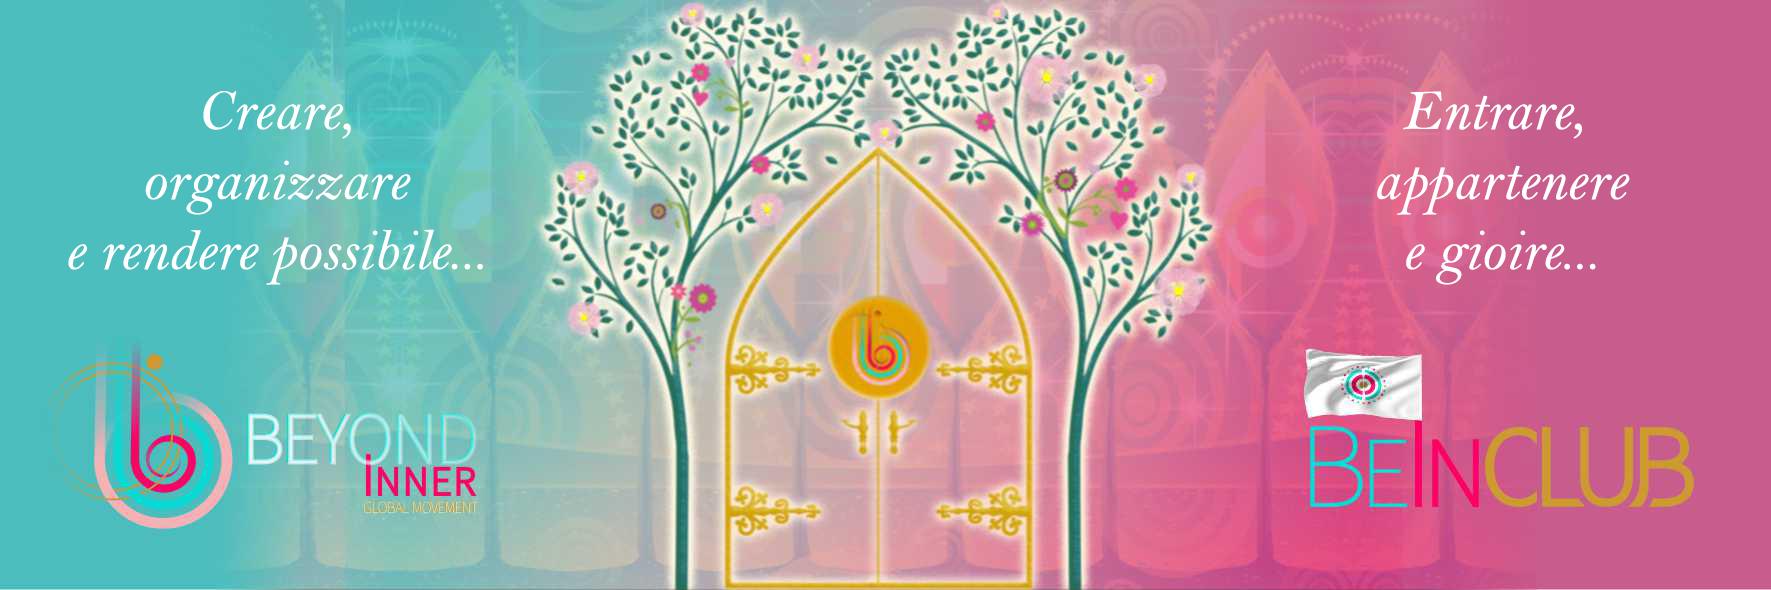 Inner-Mastery-criptomoneta-coscienza